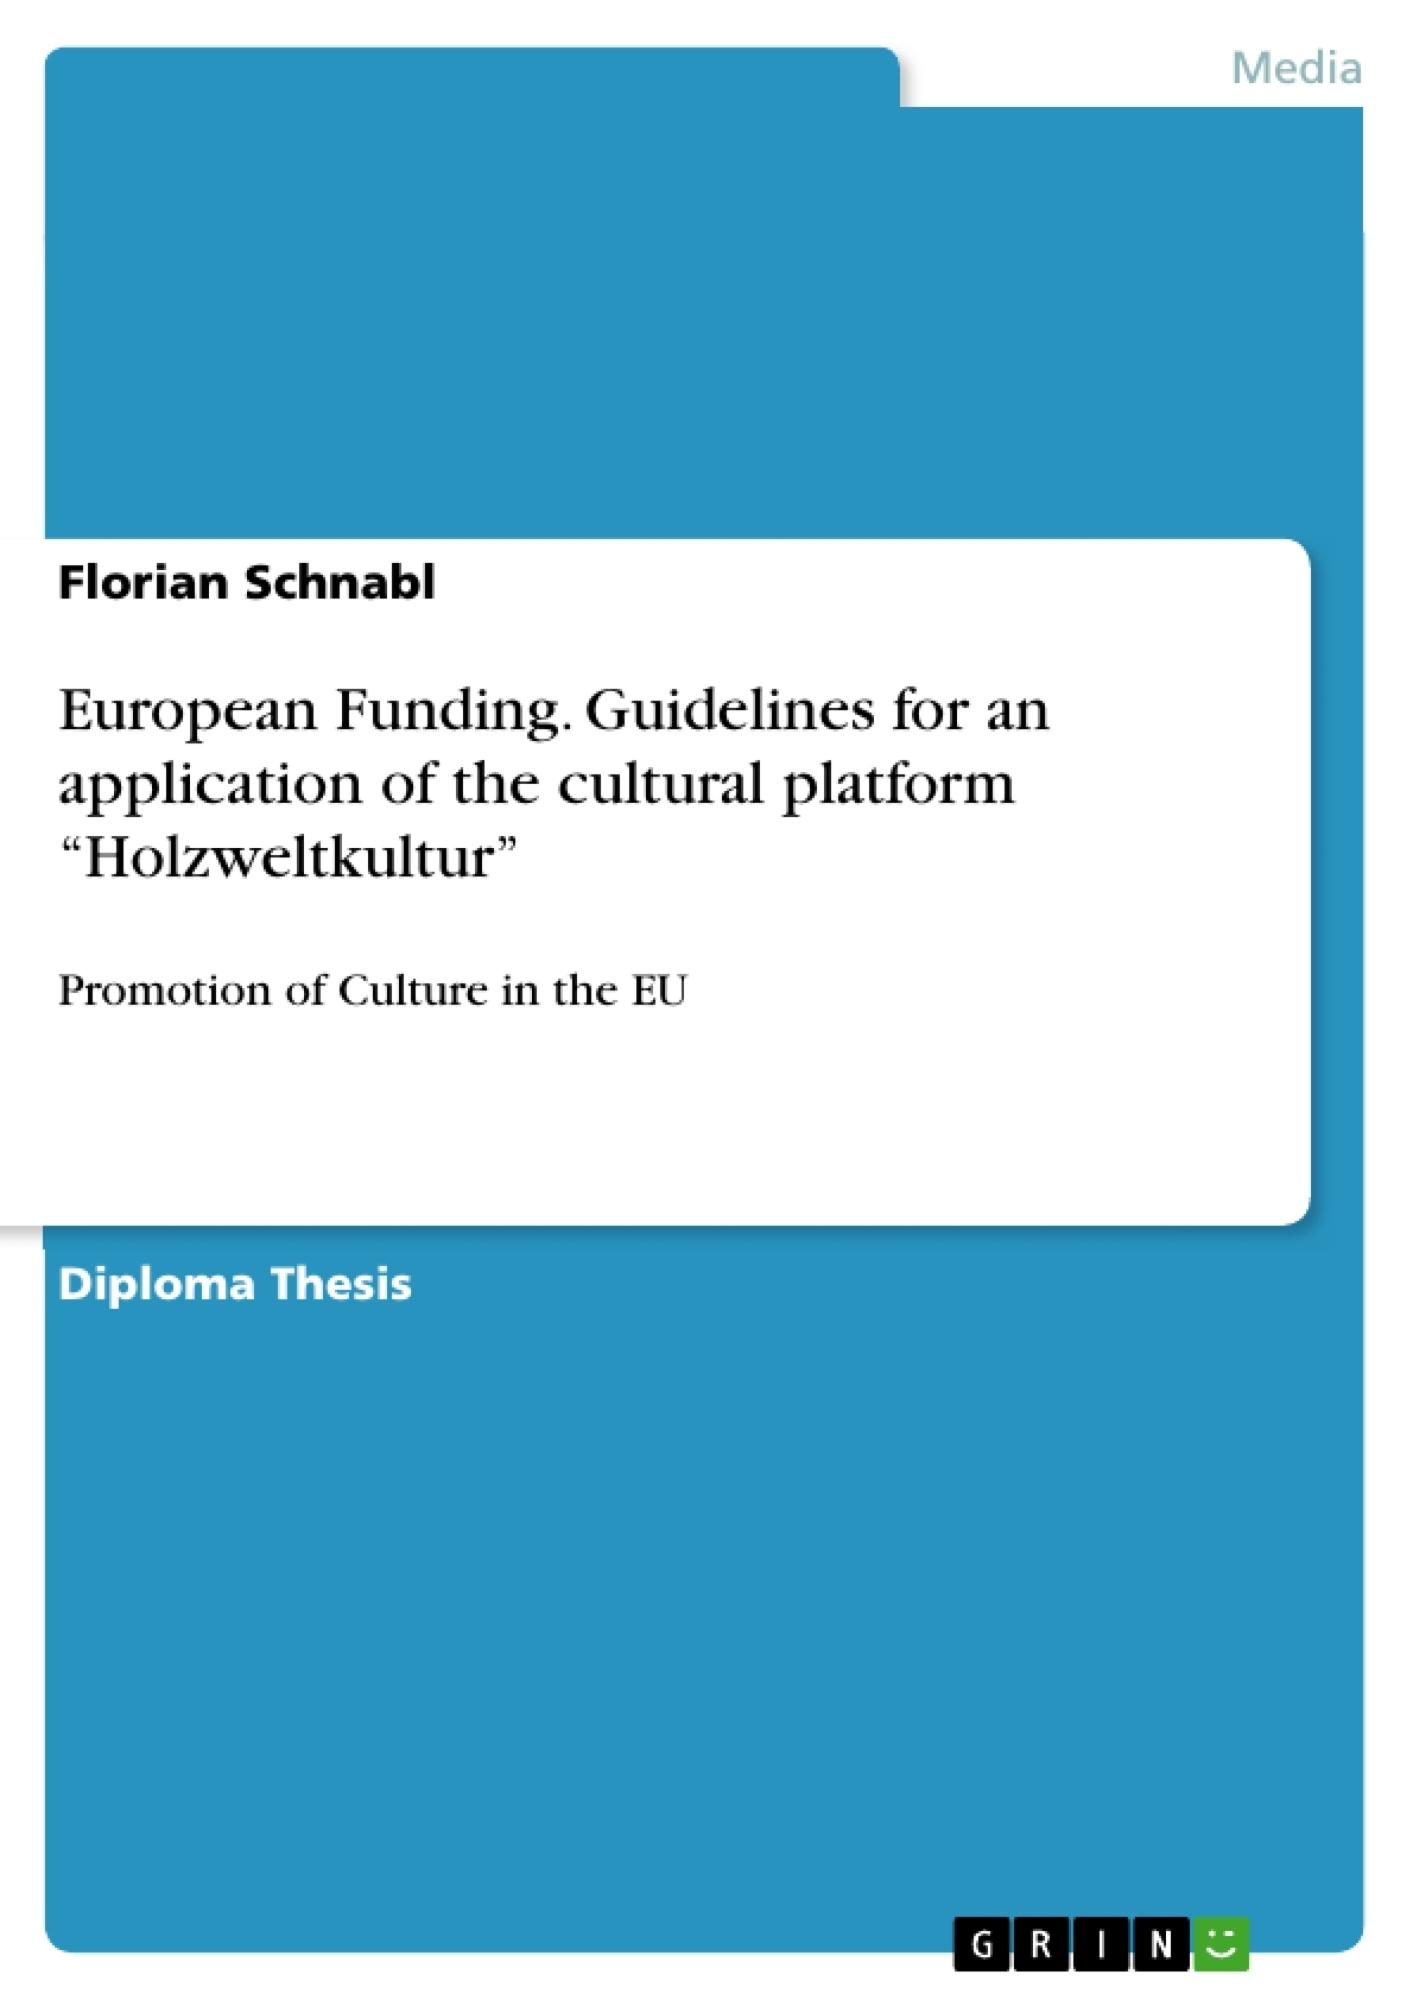 "Title: European Funding. Guidelines for an application of the cultural platform ""Holzweltkultur"""